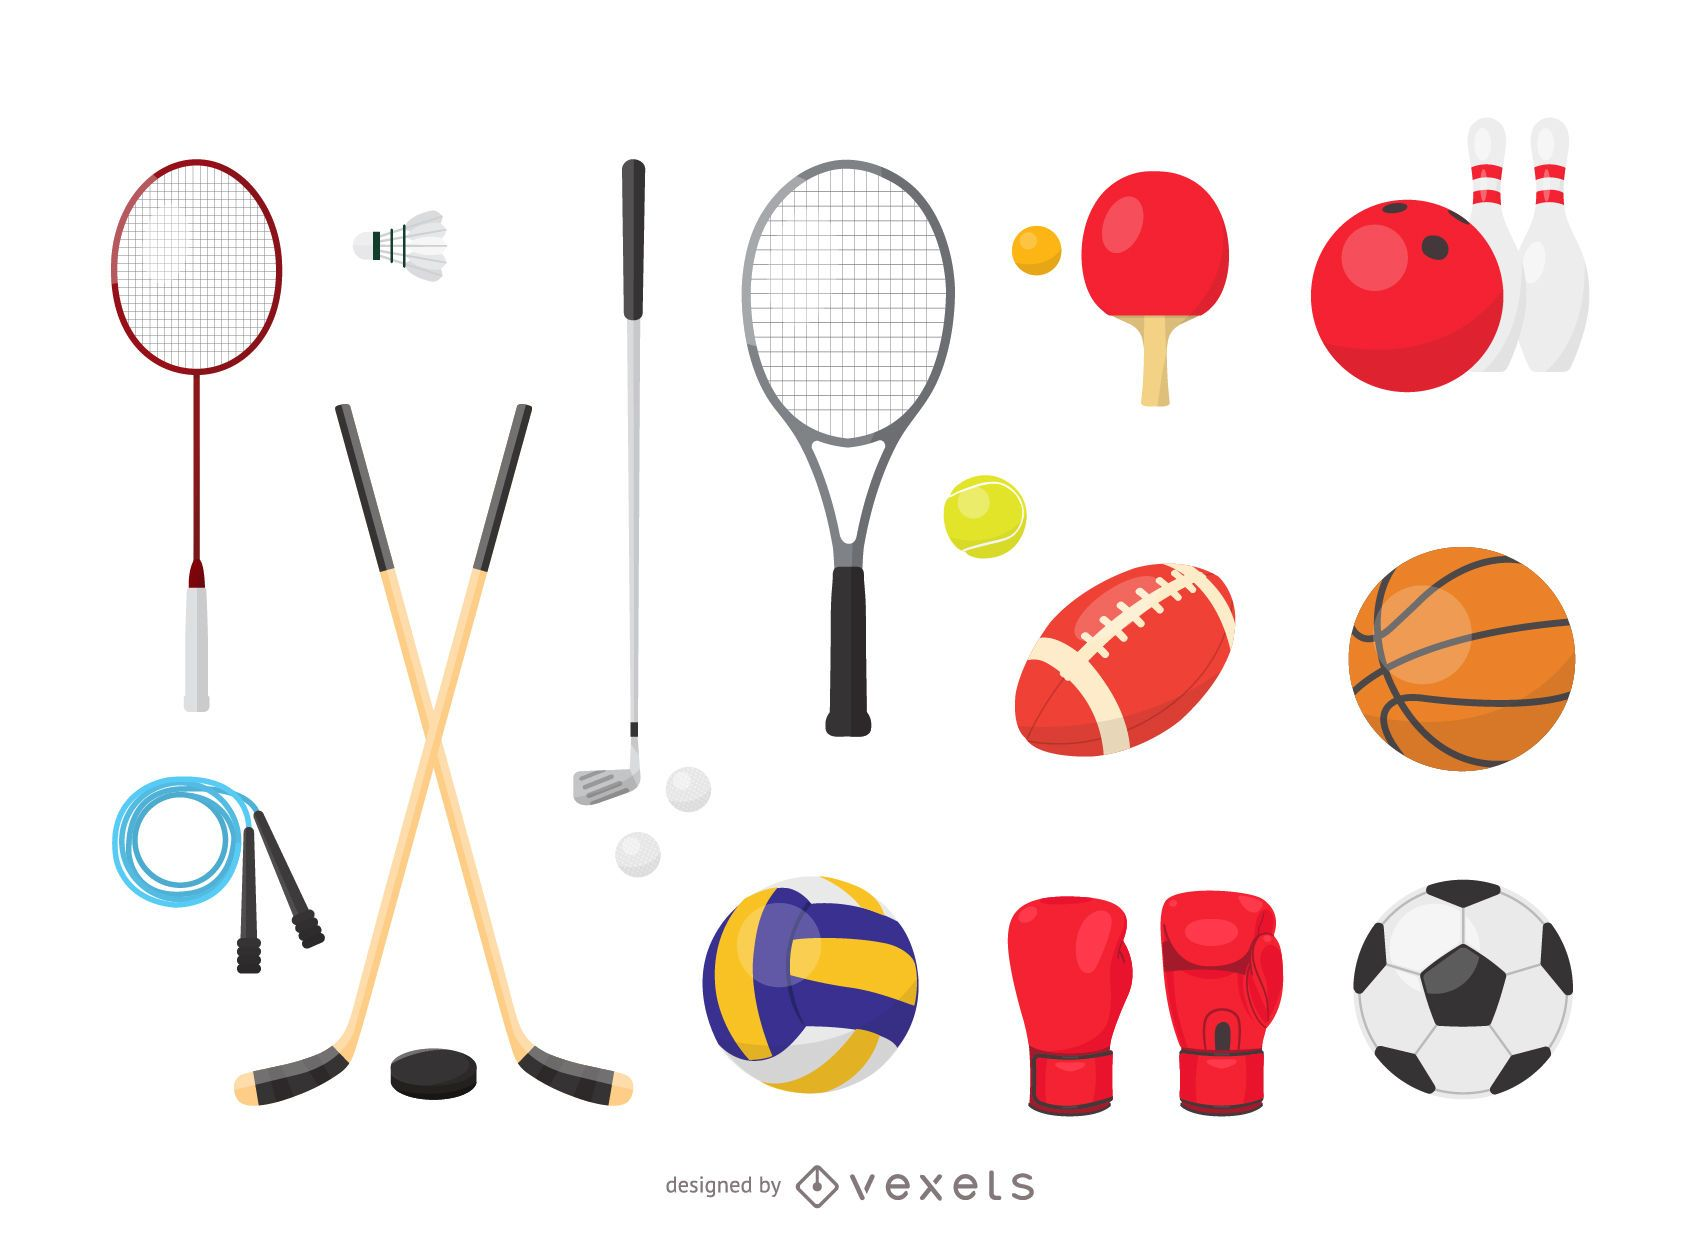 Conjunto de equipamentos de esportes vetoriais